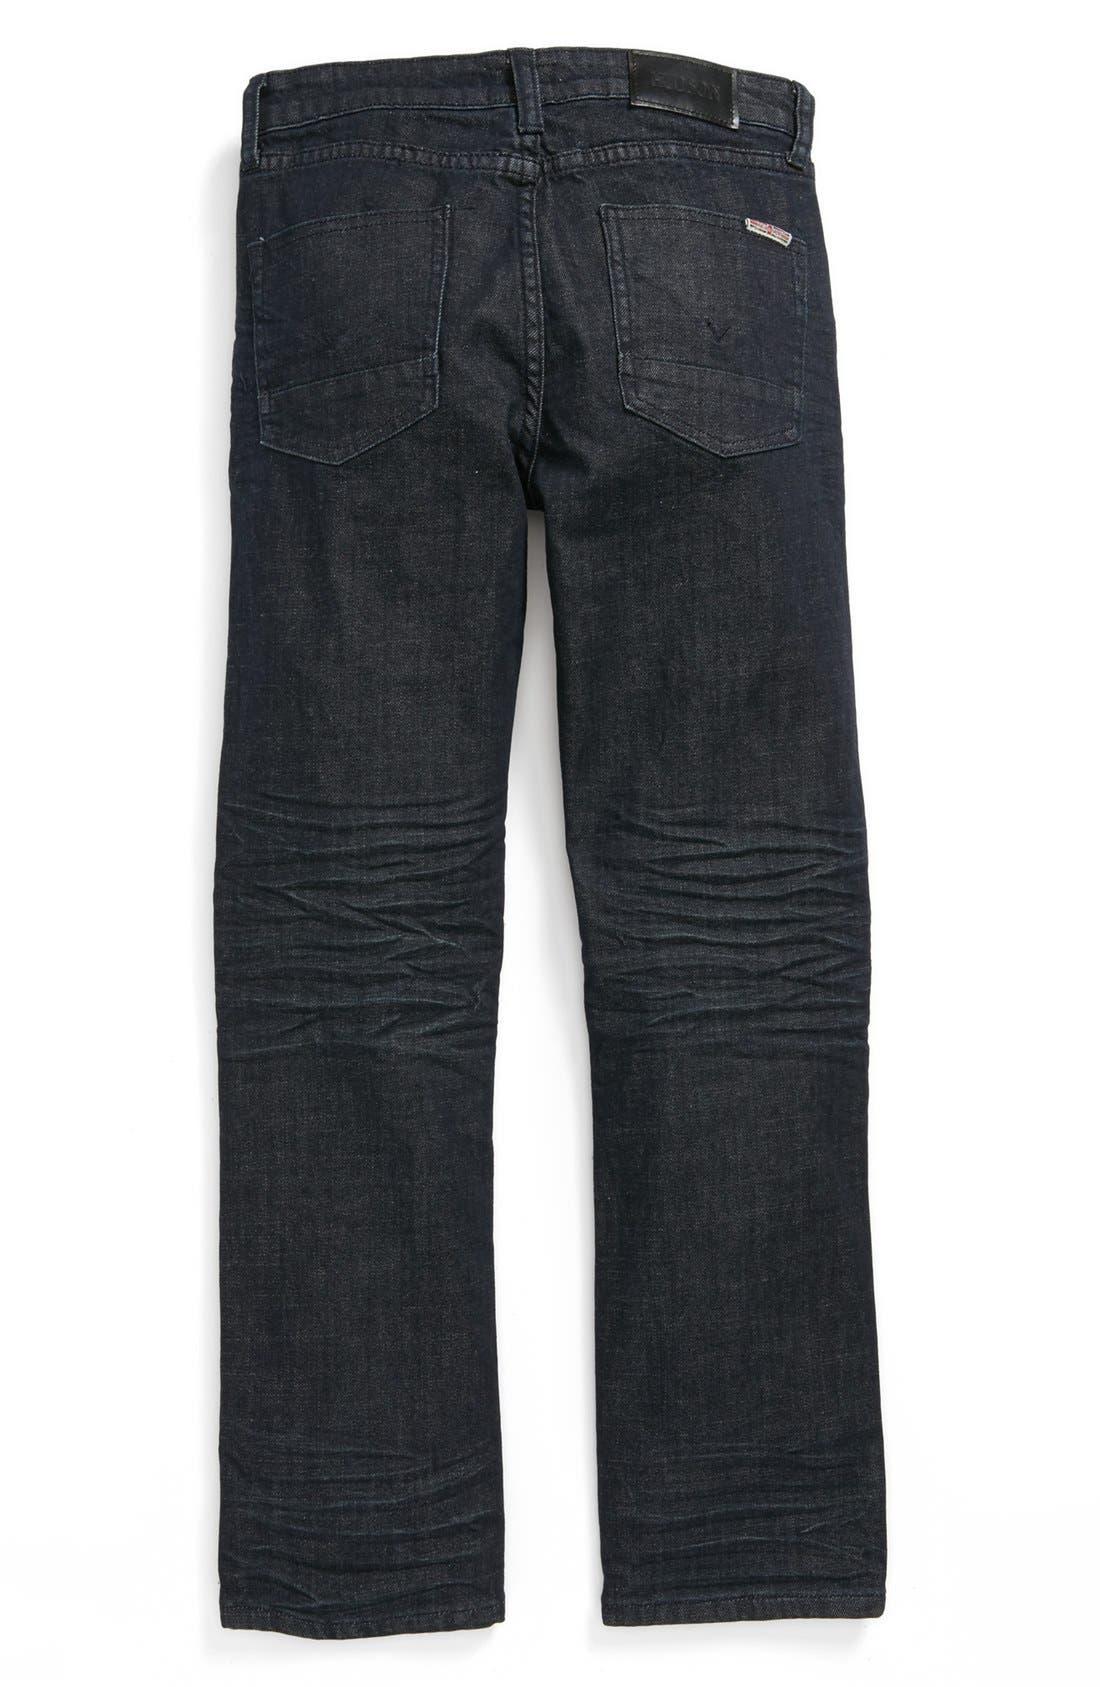 Alternate Image 1 Selected - Hudson Kids 'Parker' Straight Leg Jeans (Little Boys & Big Boys)